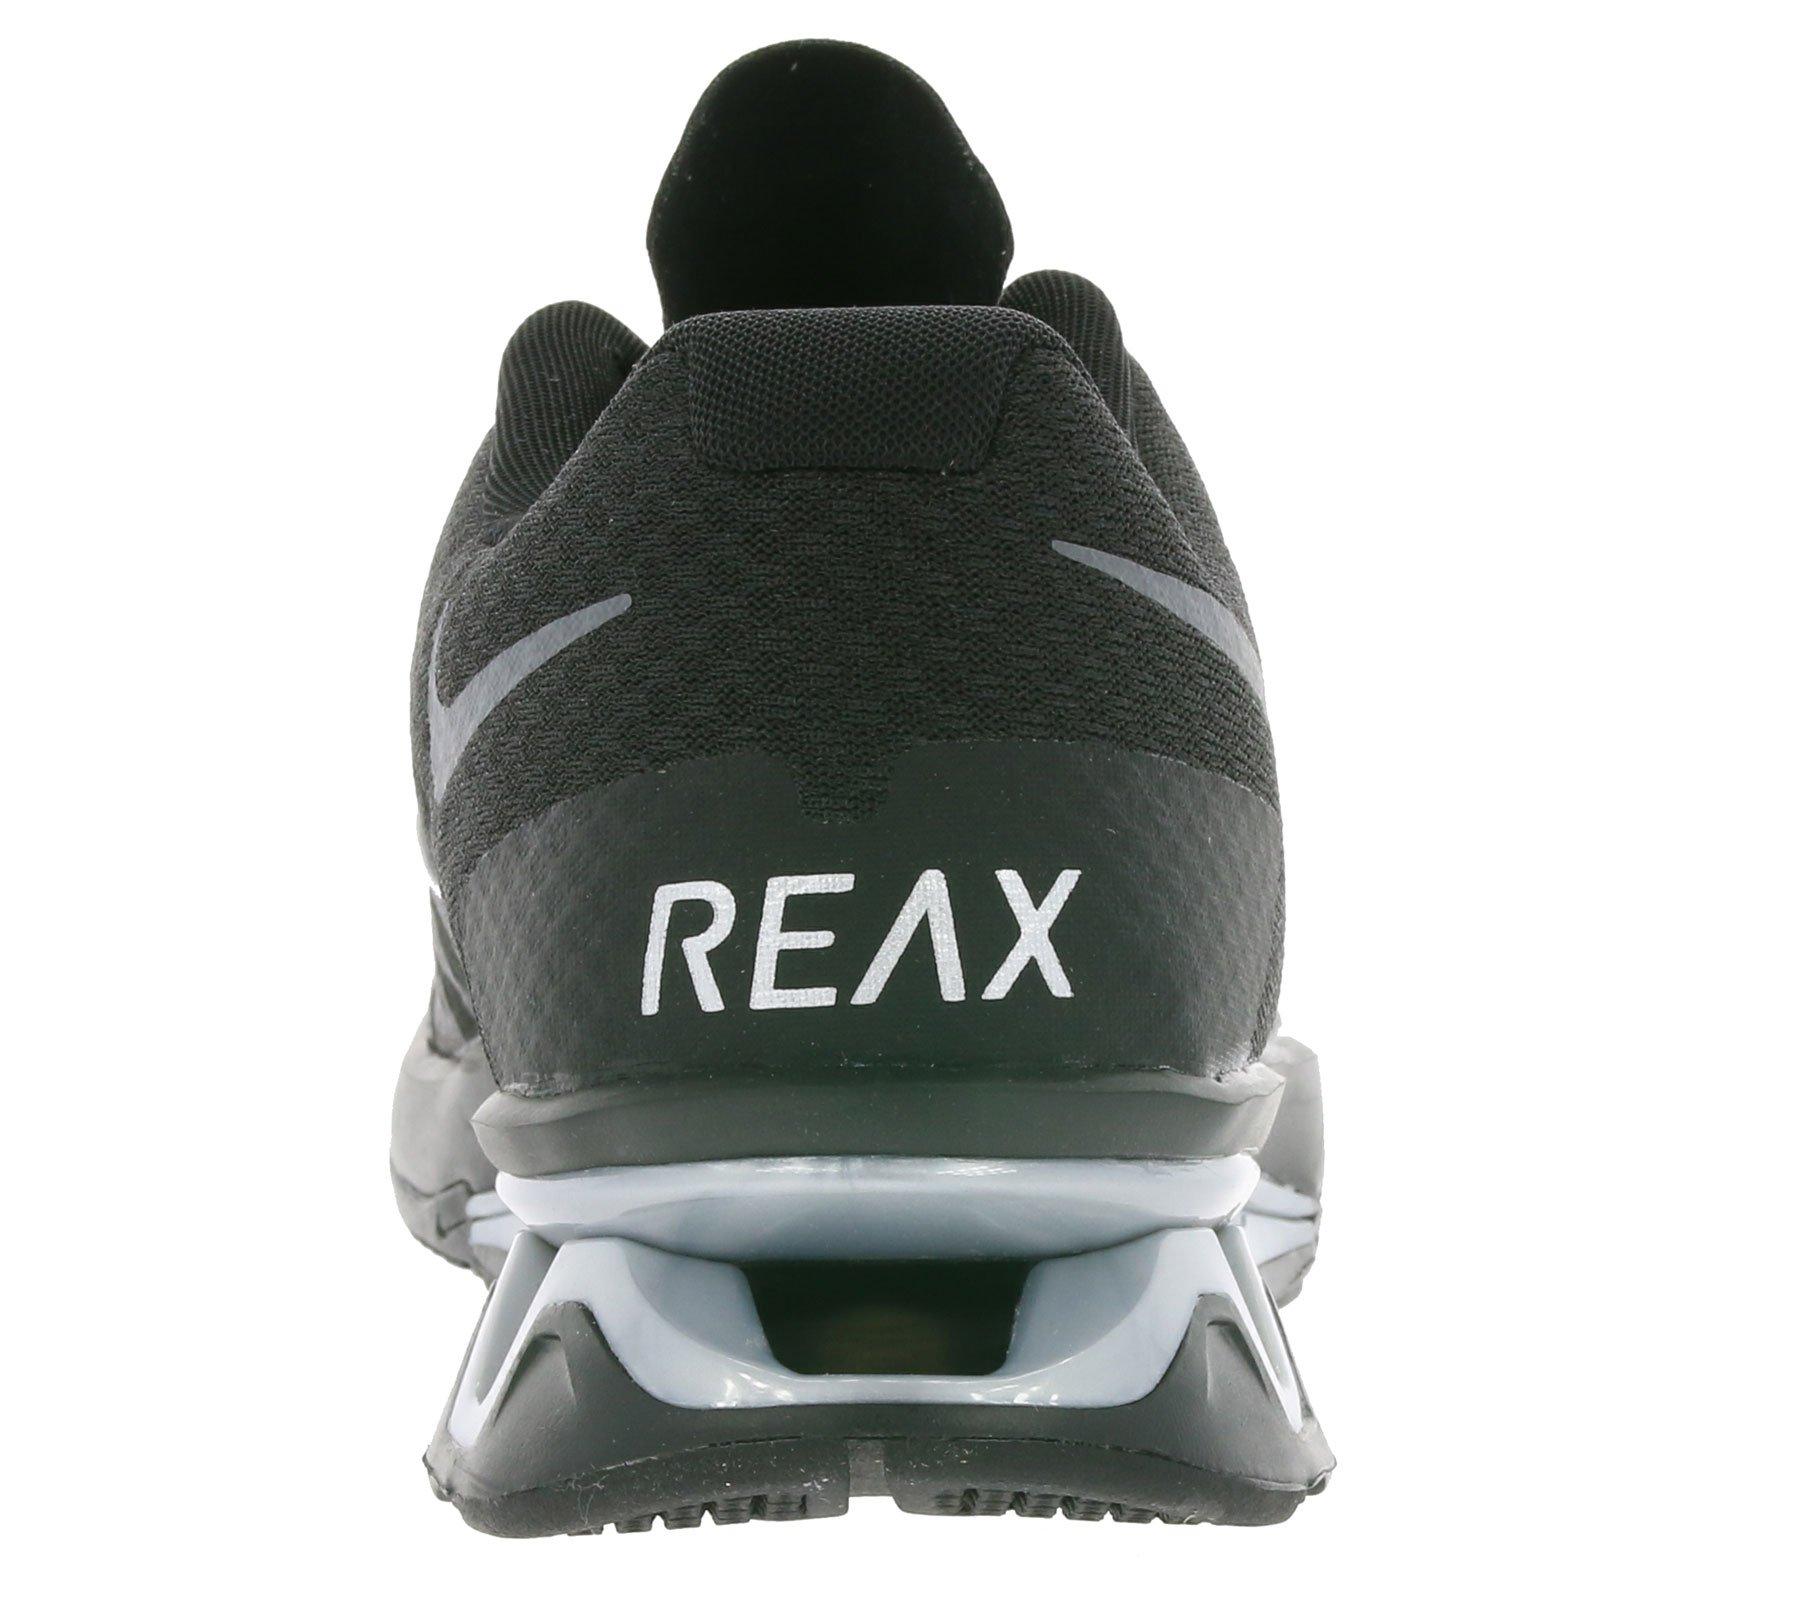 NIKE REAX LIGHTSPEED II 852694-007 852694-007 EUR 46